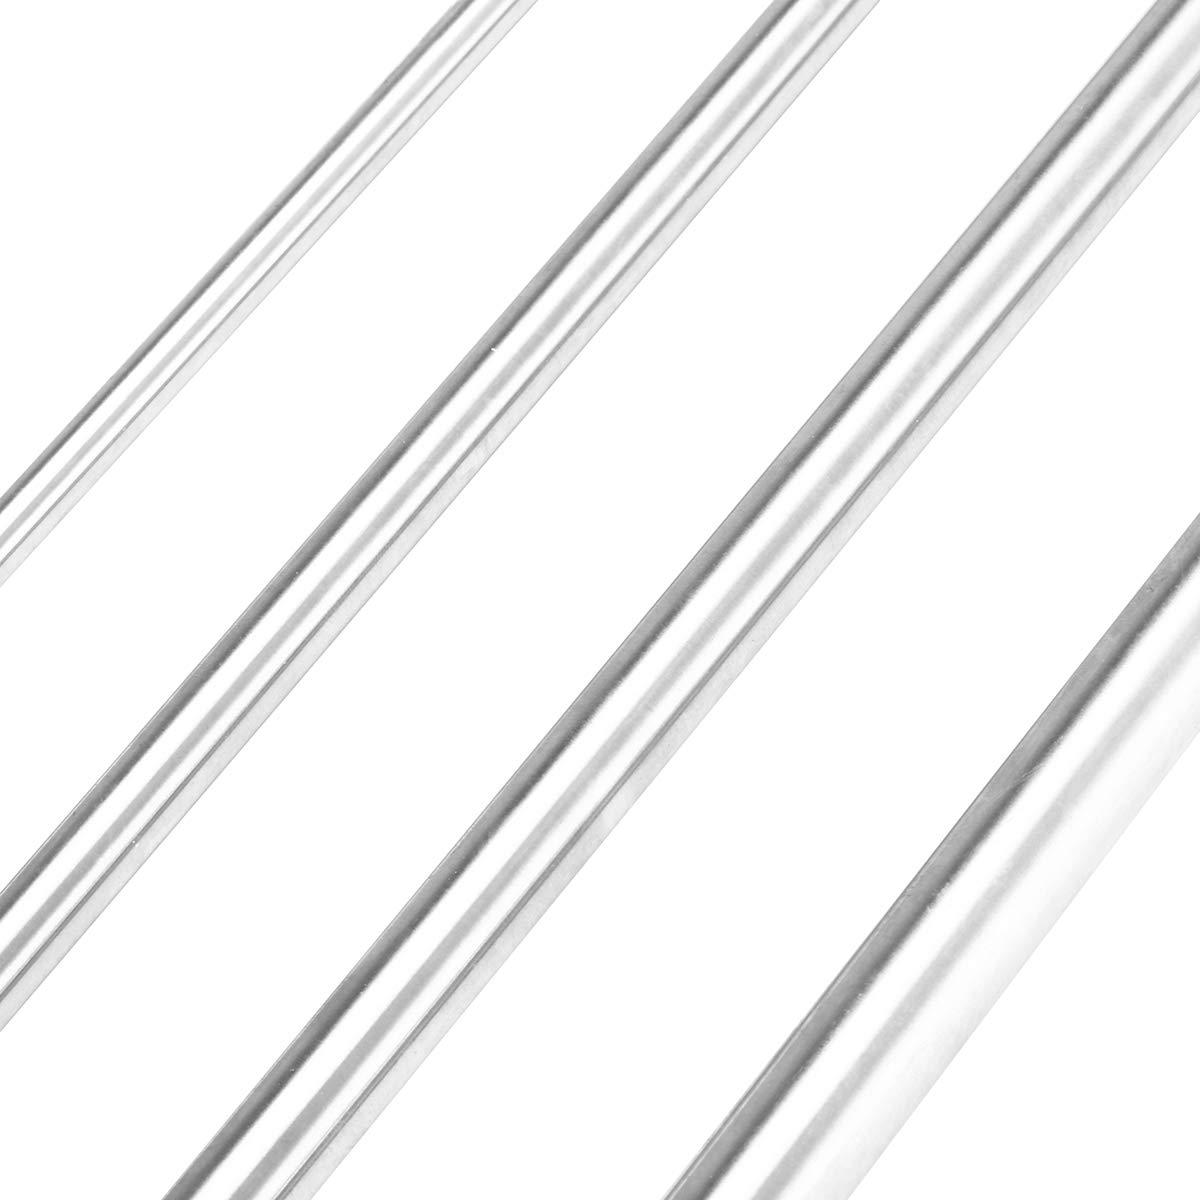 12Mm EsportsMJJ 6//8//10//12Mm Di/ámetro Varilla Longitud 400Mm Cilindro De Acero Linear Rail Eje Lineal Eje /Óptico